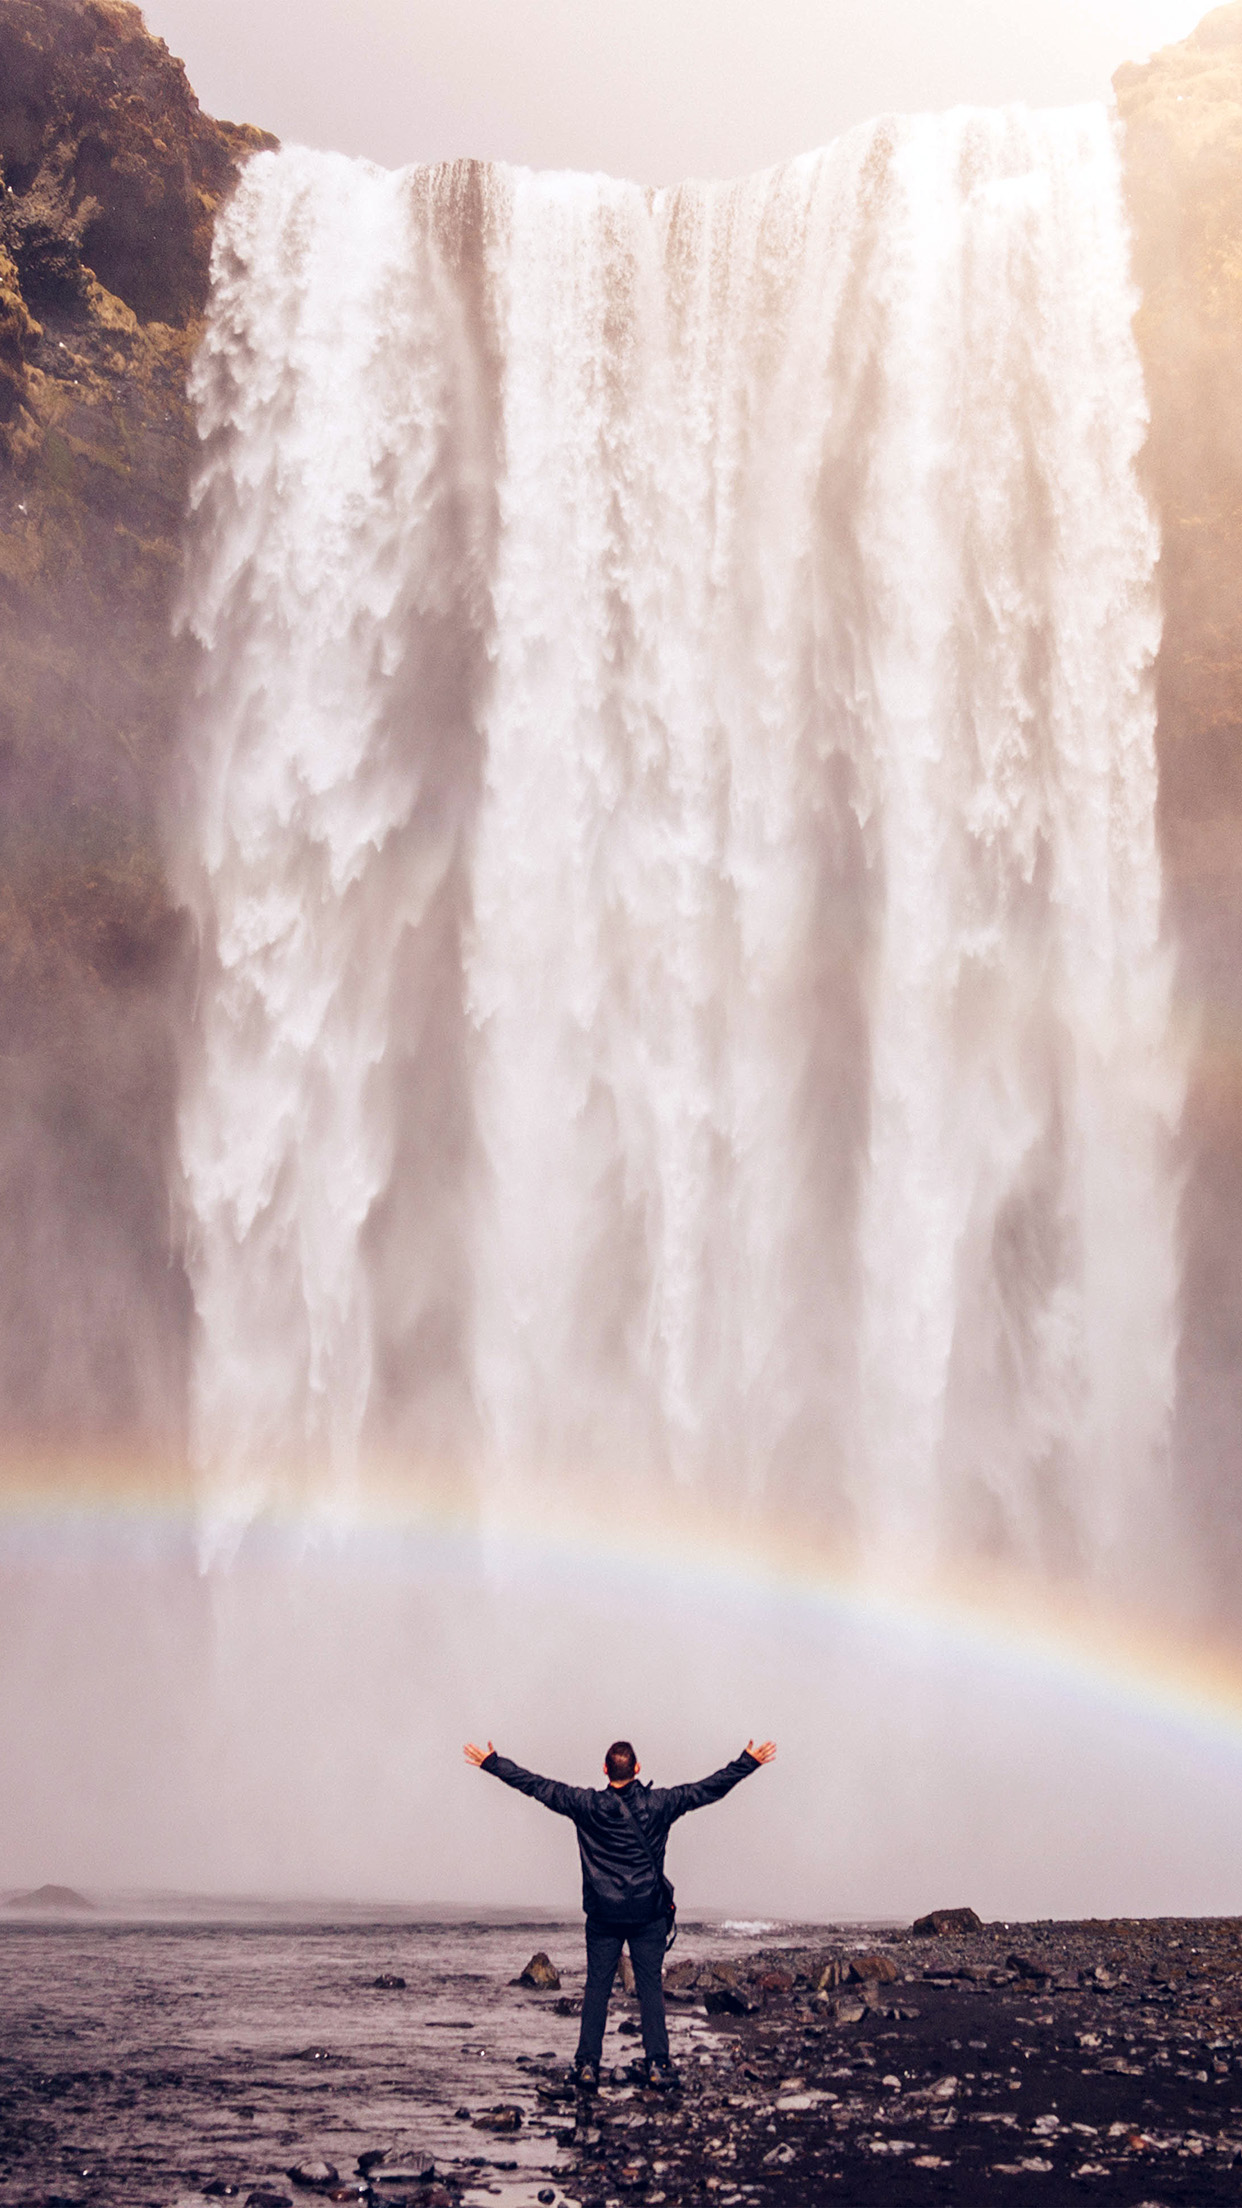 Waterfall Rainbow 3Wallpapers iPhone Parallax 3Wallpapers : notre sélection de fonds d'écran du 04/12/2016